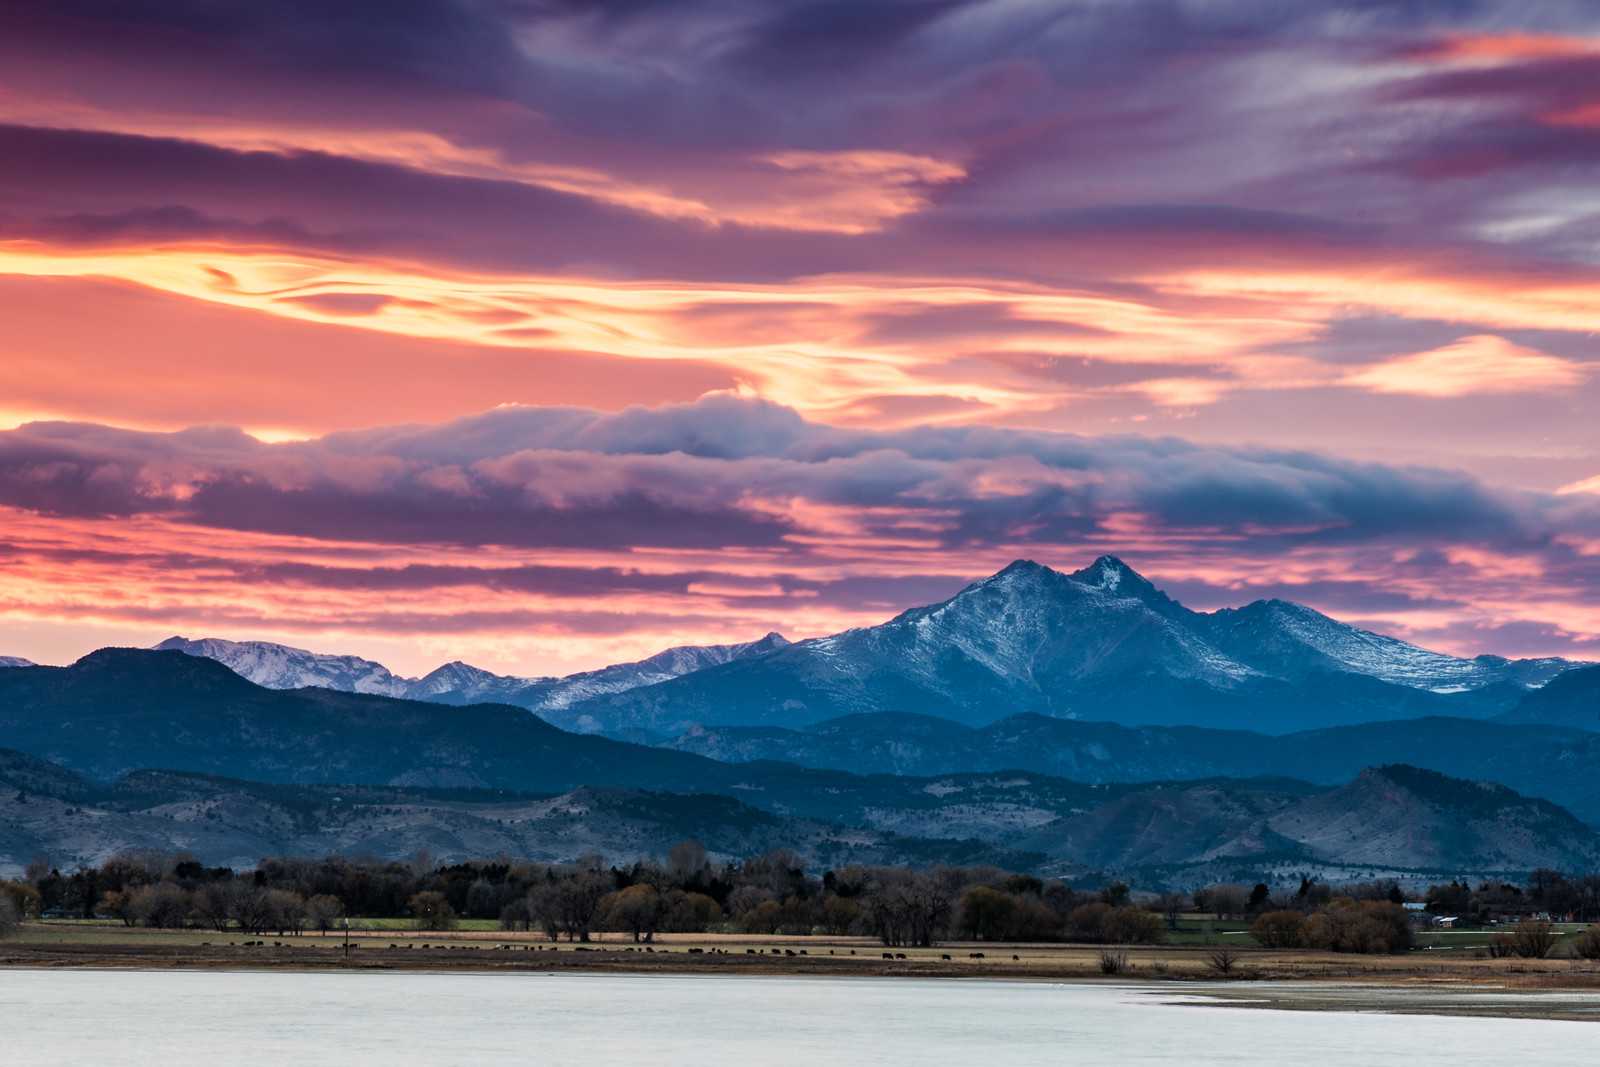 Longs Peak from Longmont, Colorado at Sunset